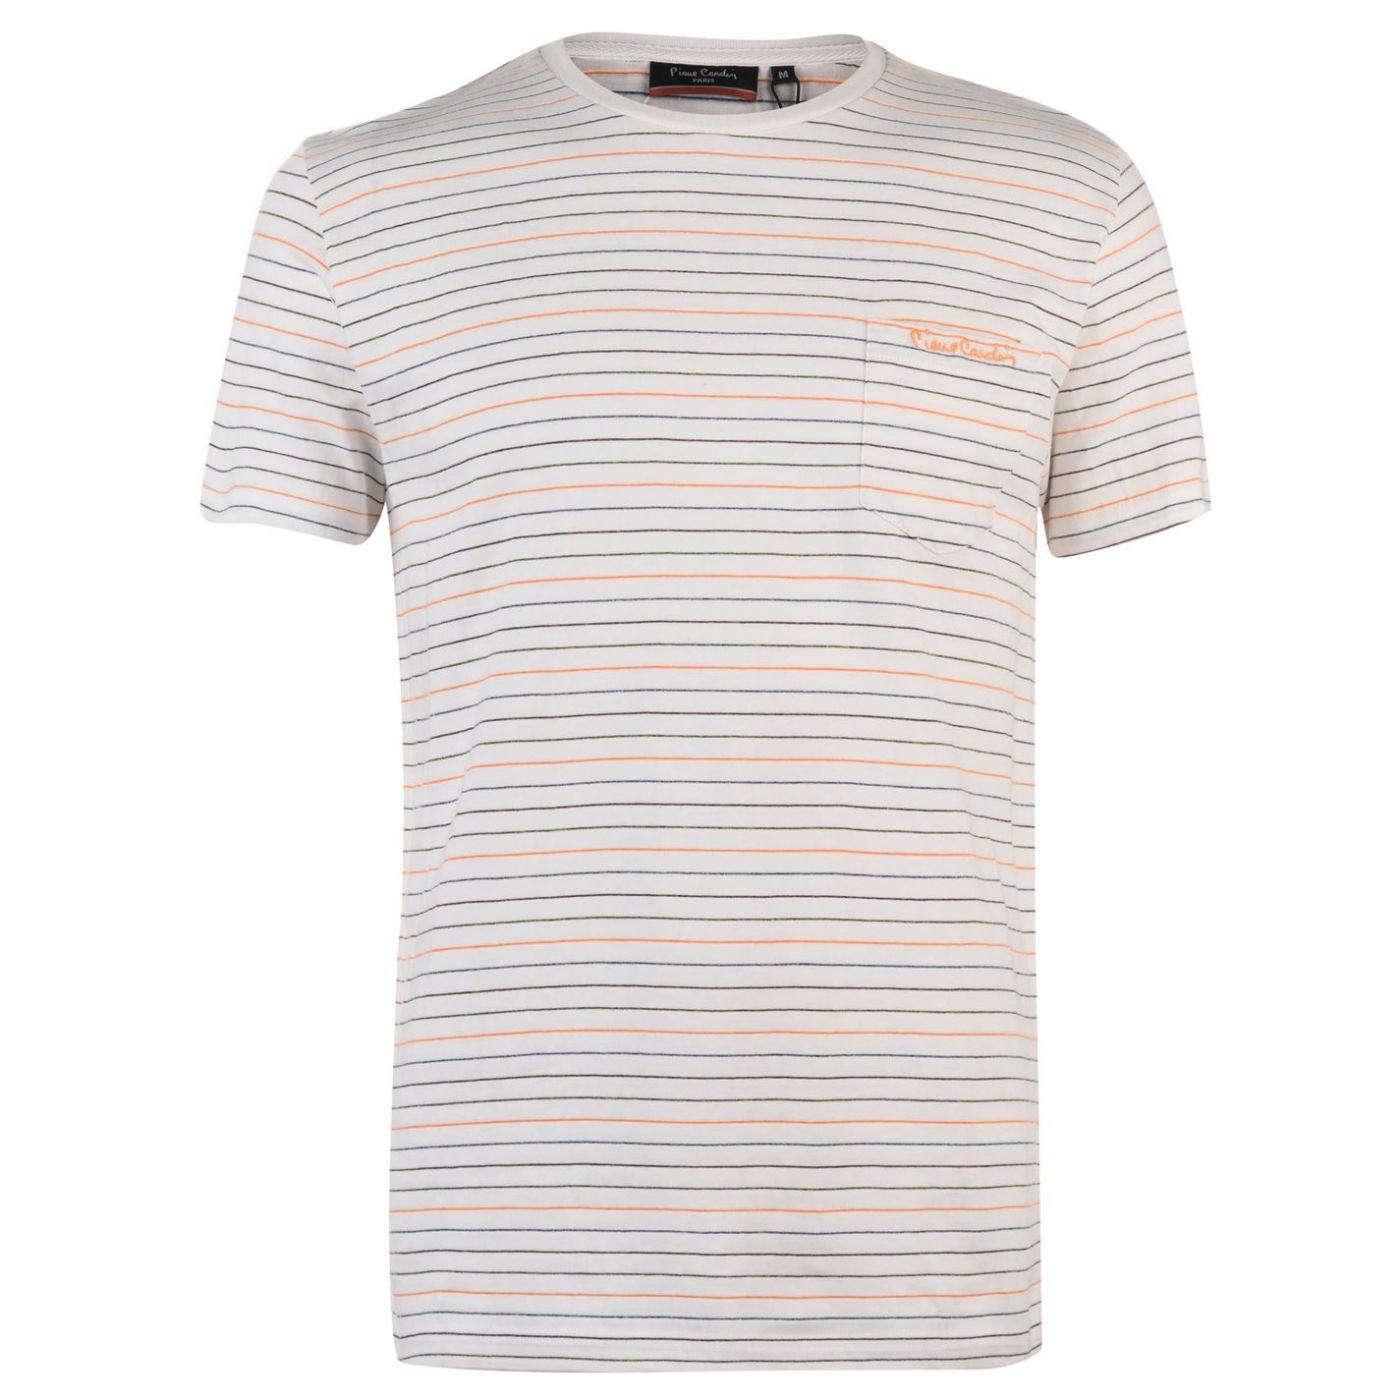 Pierre Cardin Pinstripe T Shirt Mens